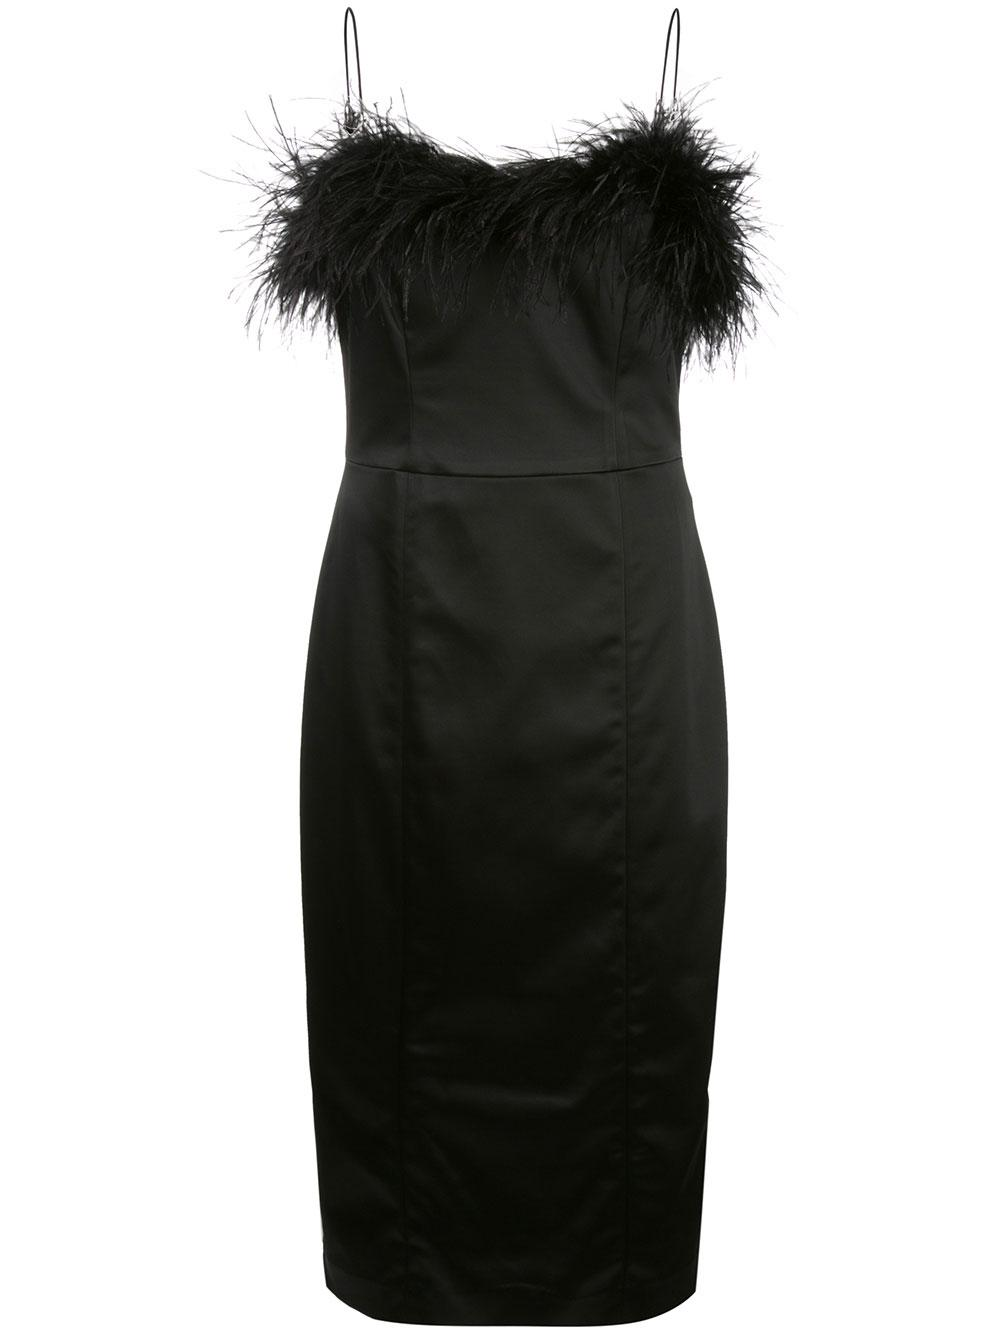 Lilya Sheath Dress With Feathers Item # 1910NV0092793